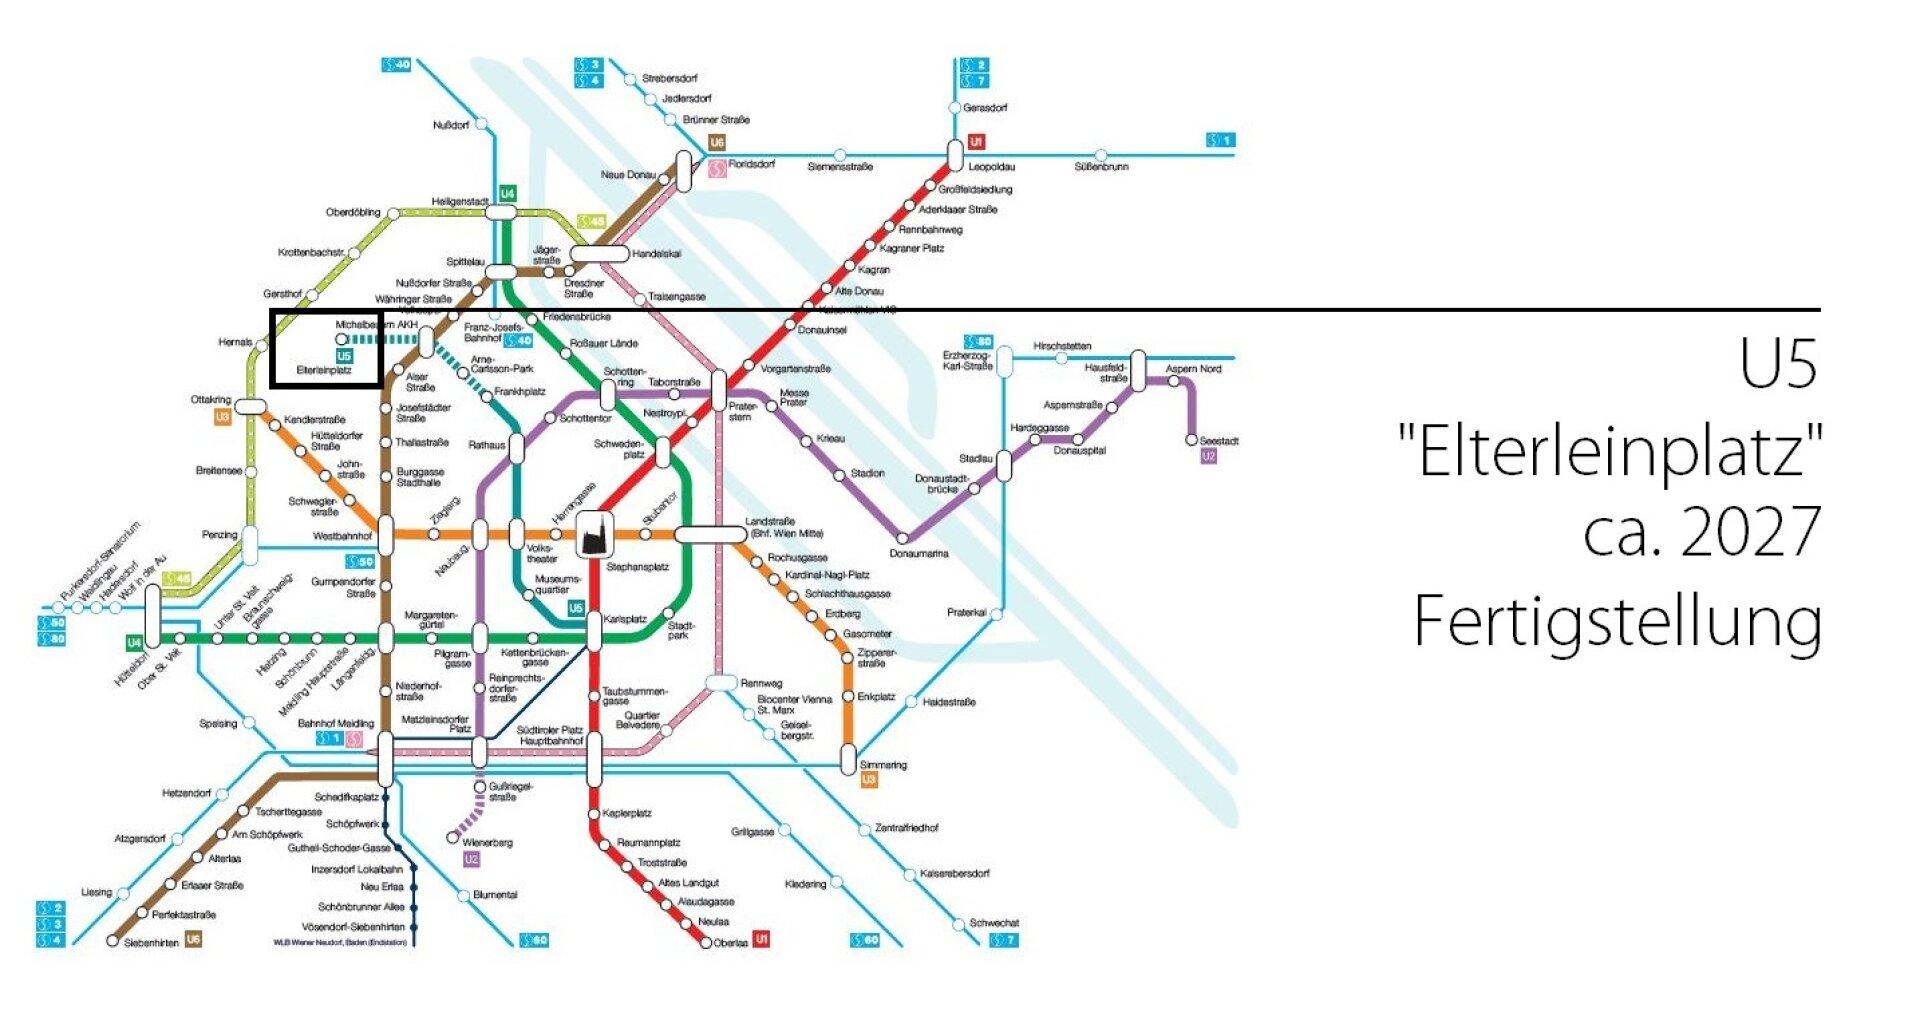 U-Bahn Plan U5 Elterleinplatz